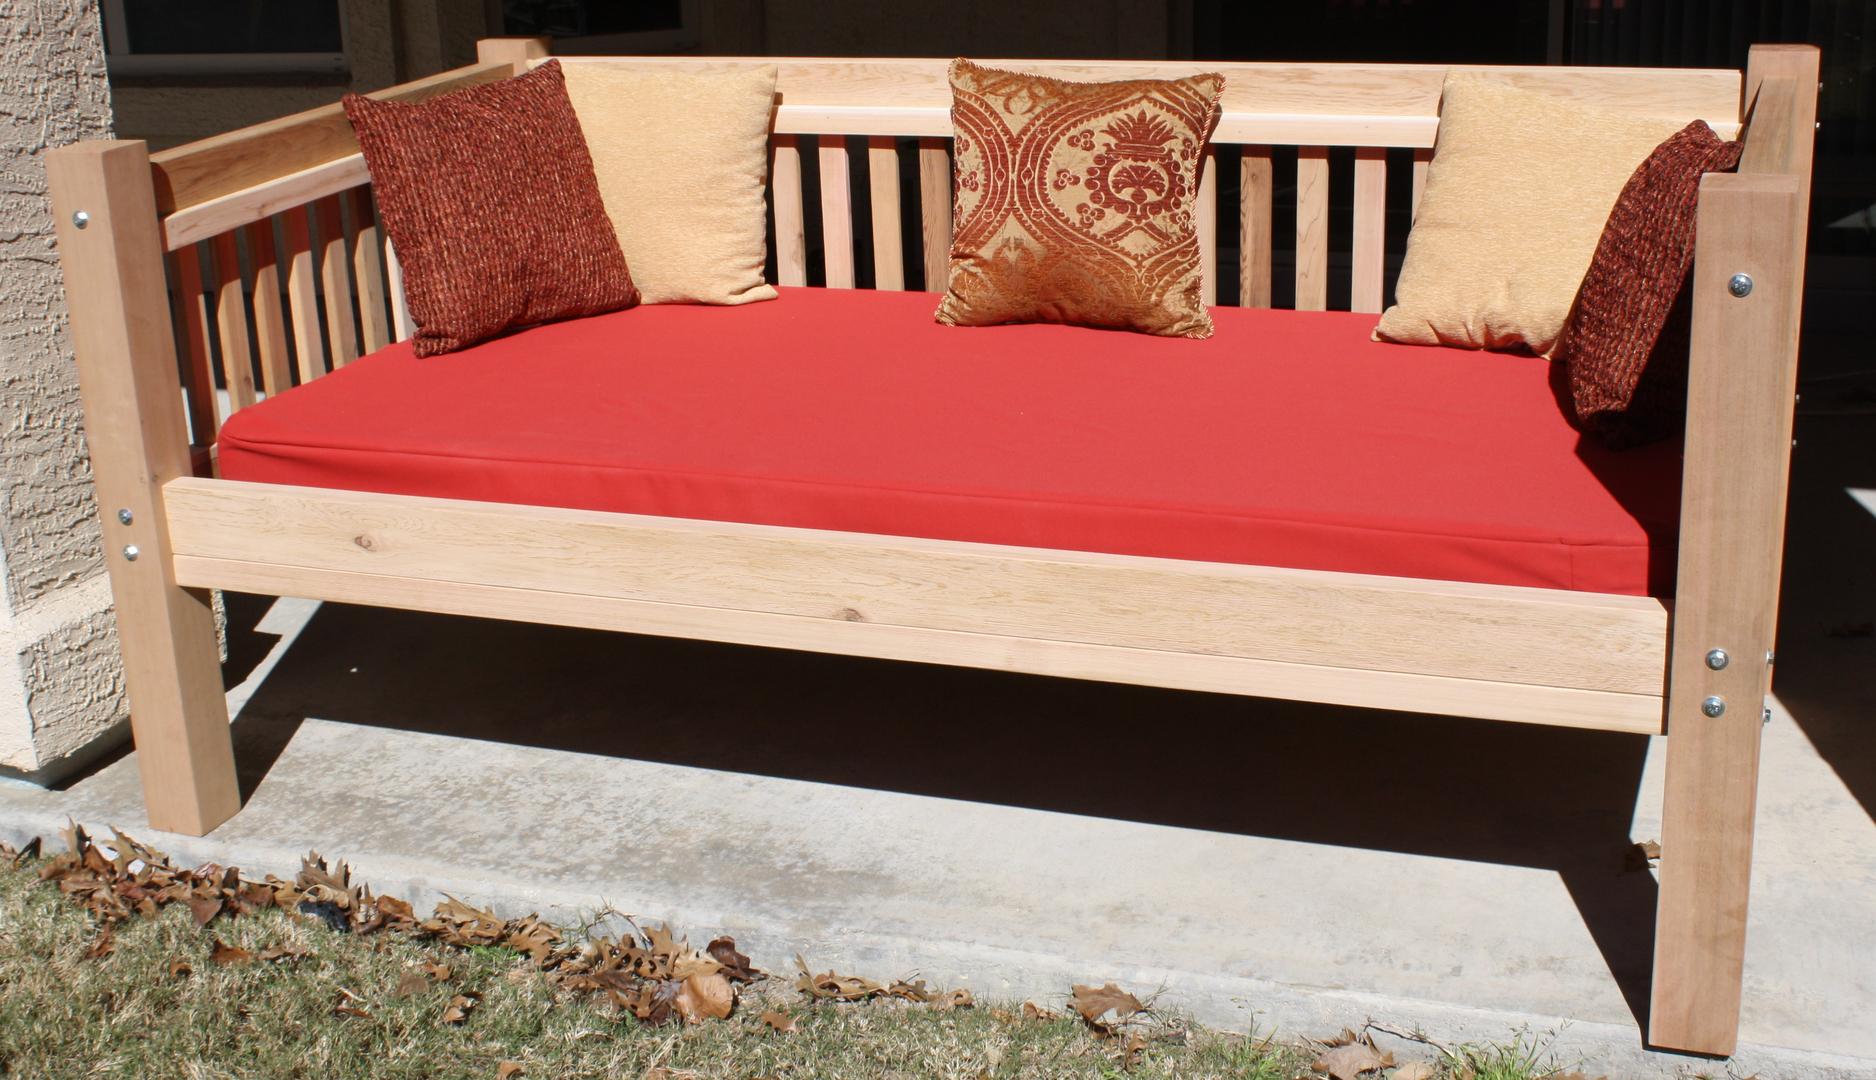 Mattress Sized Bed Cushions